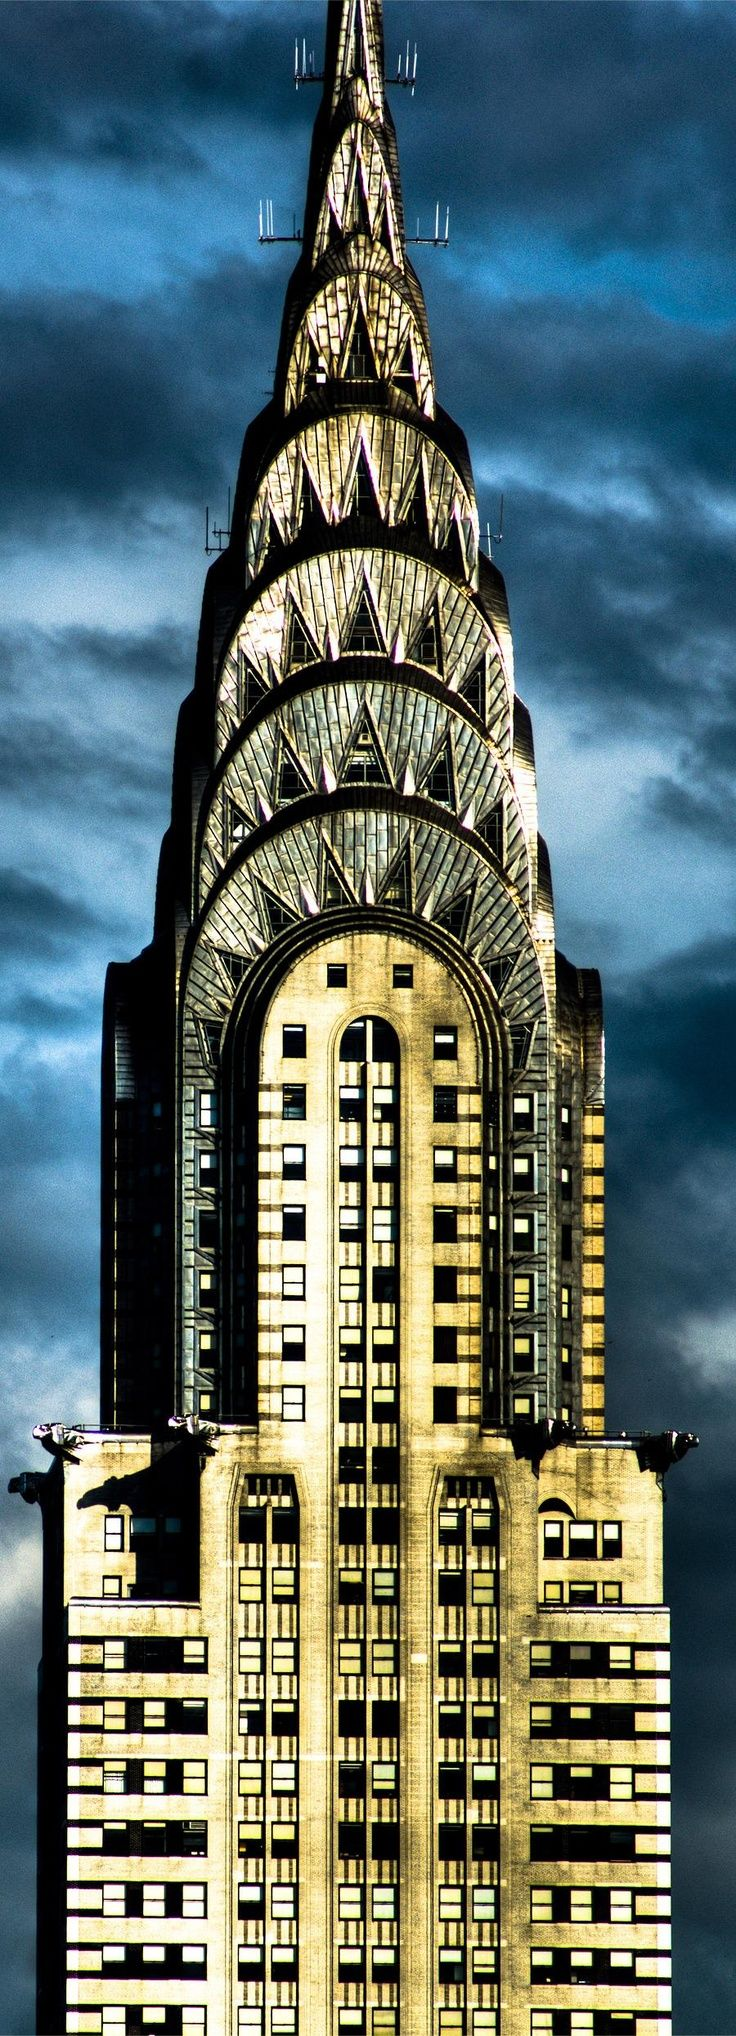 Chrysler Building - 1930 - Manhattan, New York, United States